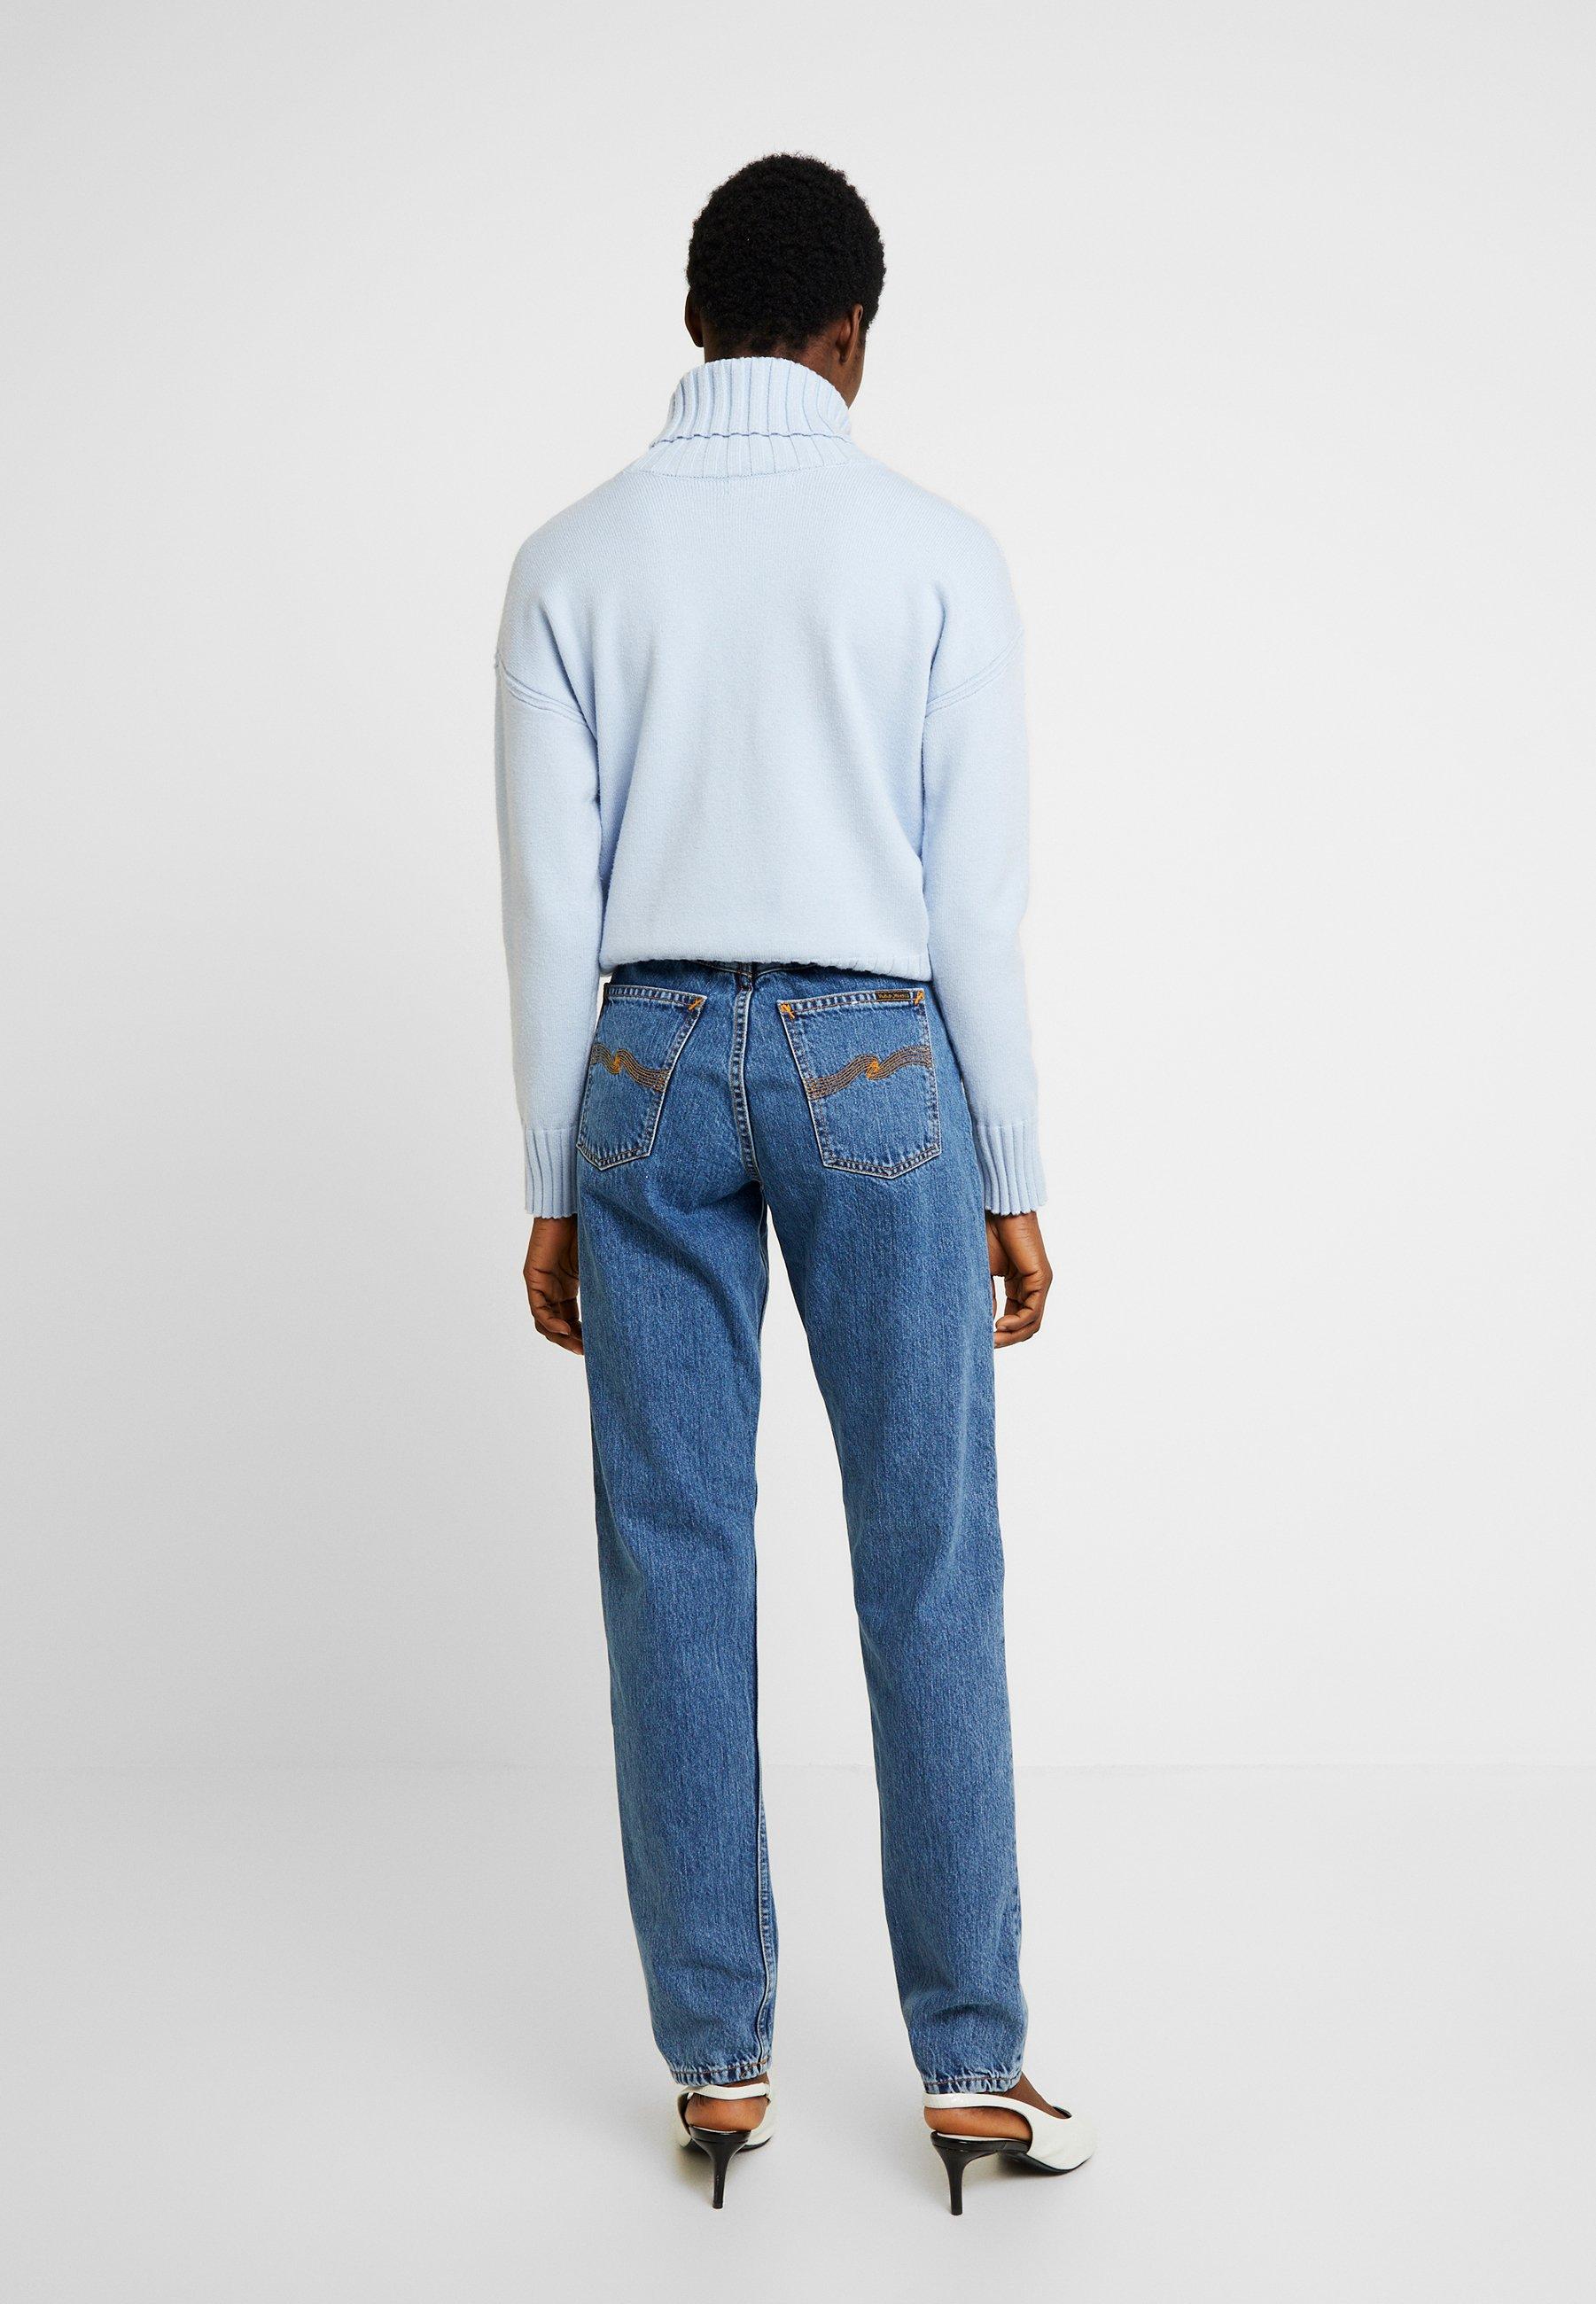 Nudie Jeans Breezy Britt - Straight Leg Friendly Blue